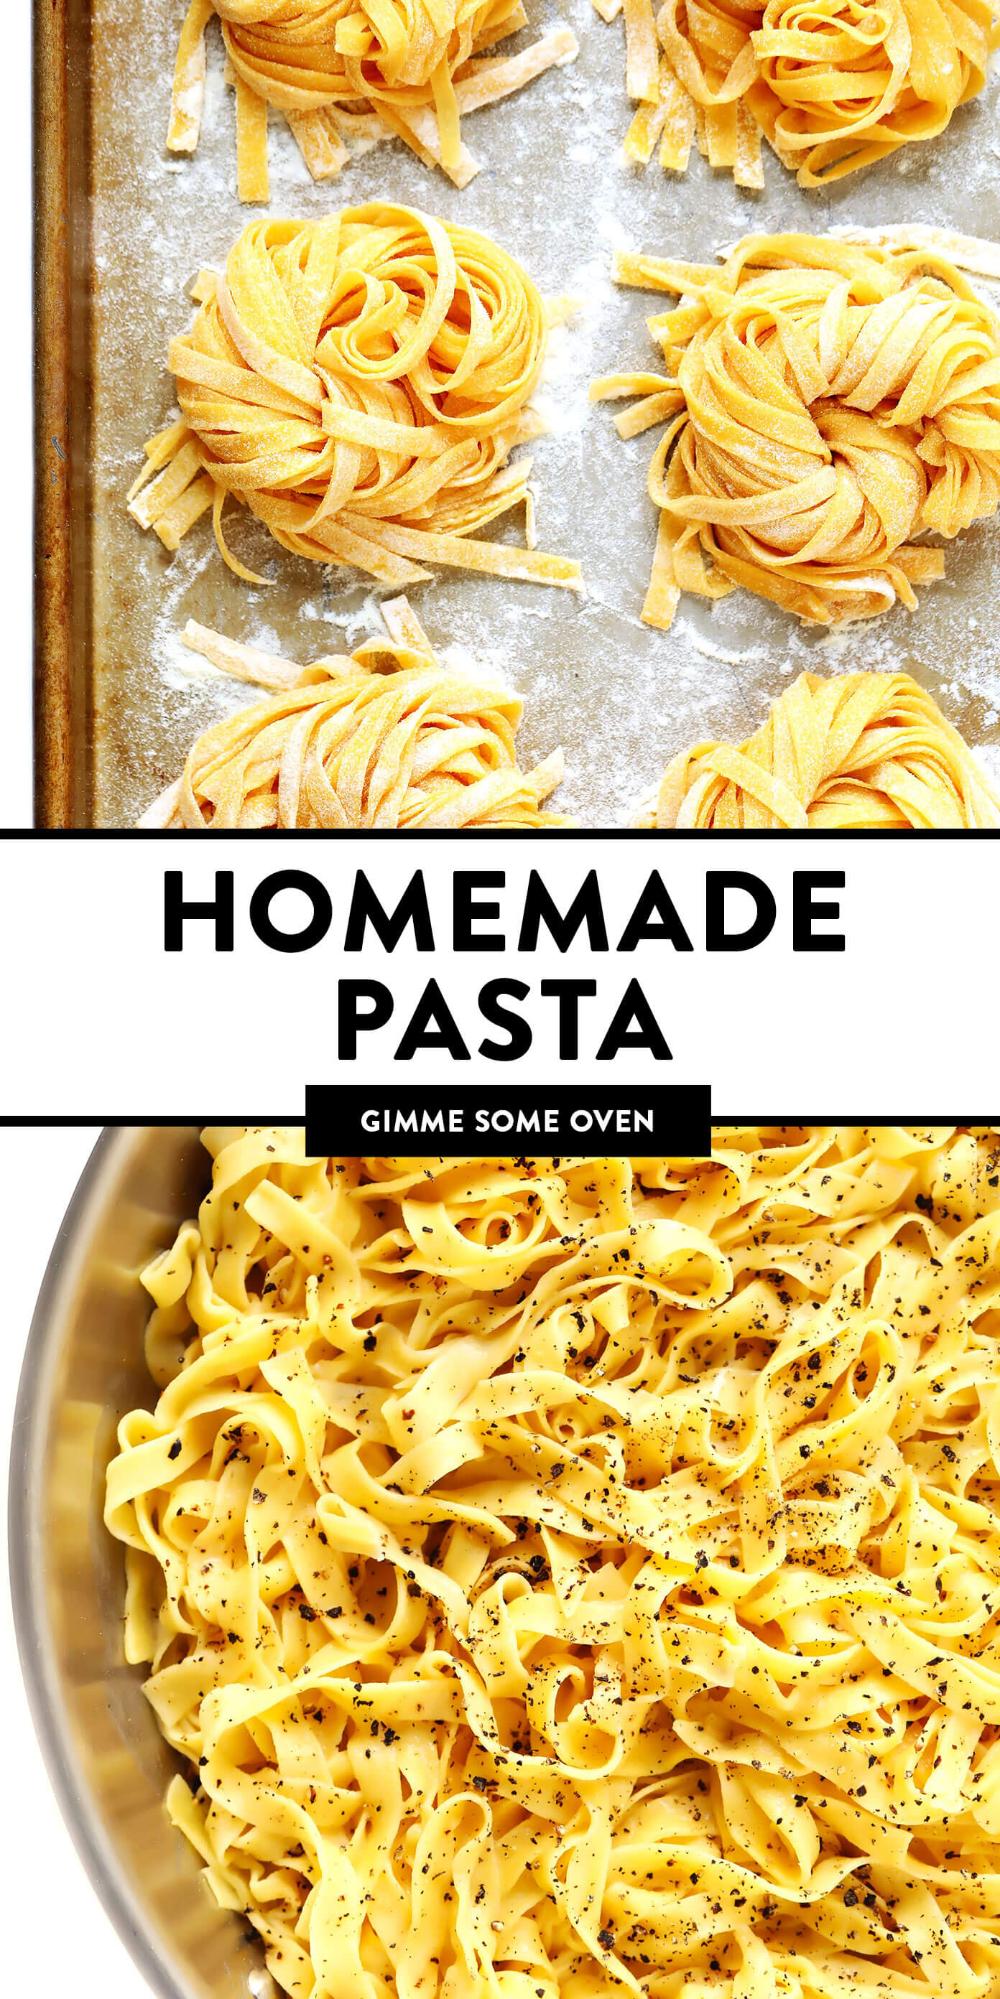 Homemade Pasta Gimme Some Oven Recipe Homemade Pasta Recipe Food Processor Recipes Cooking Fresh Pasta